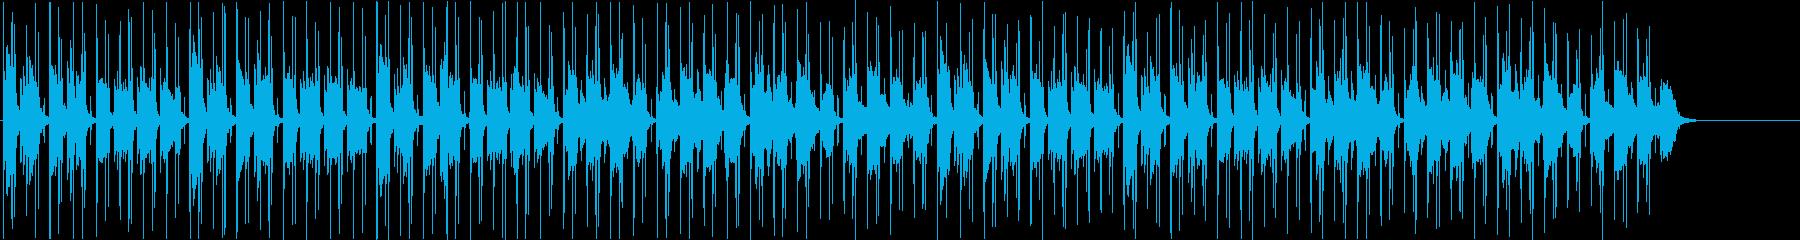 Hannon (Reprise)の再生済みの波形